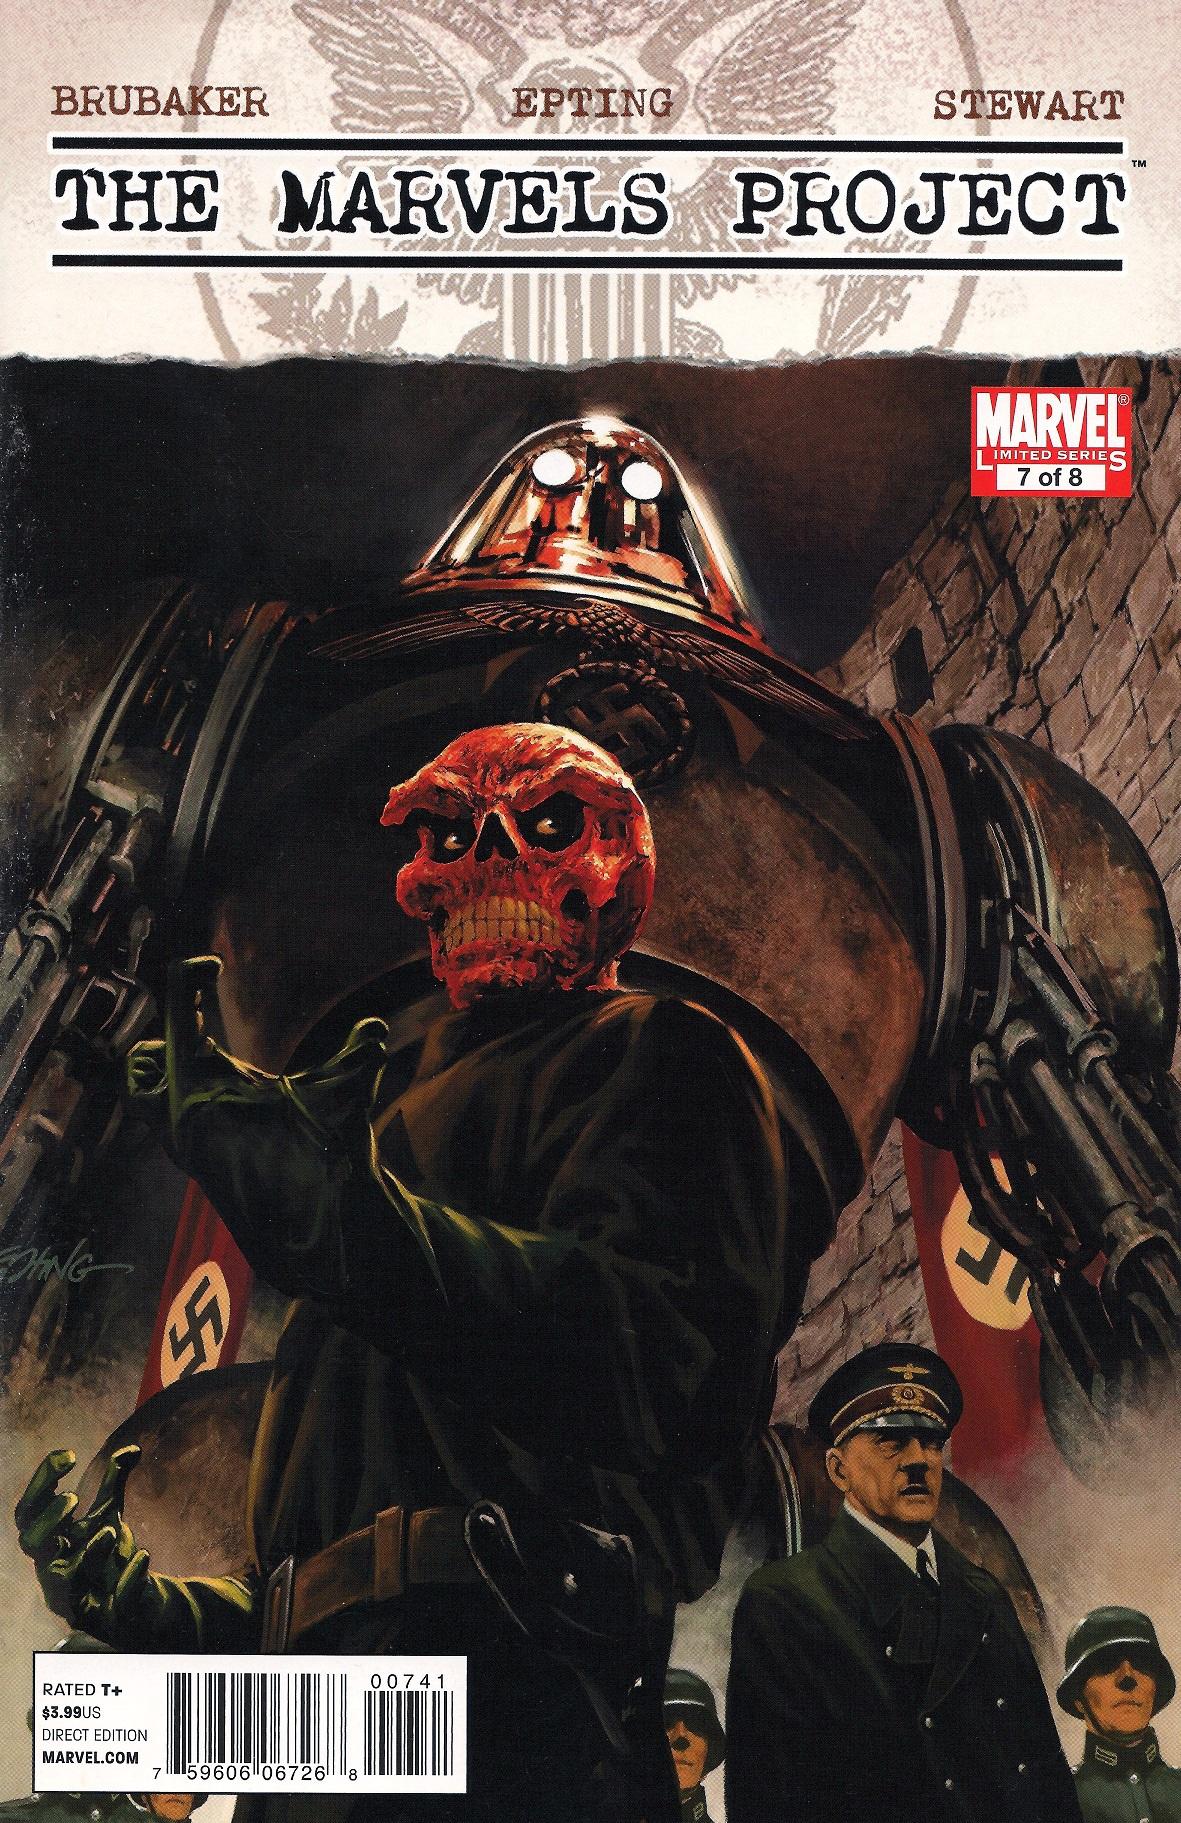 Marvels Project Vol 1 7 Epting Variant.jpg